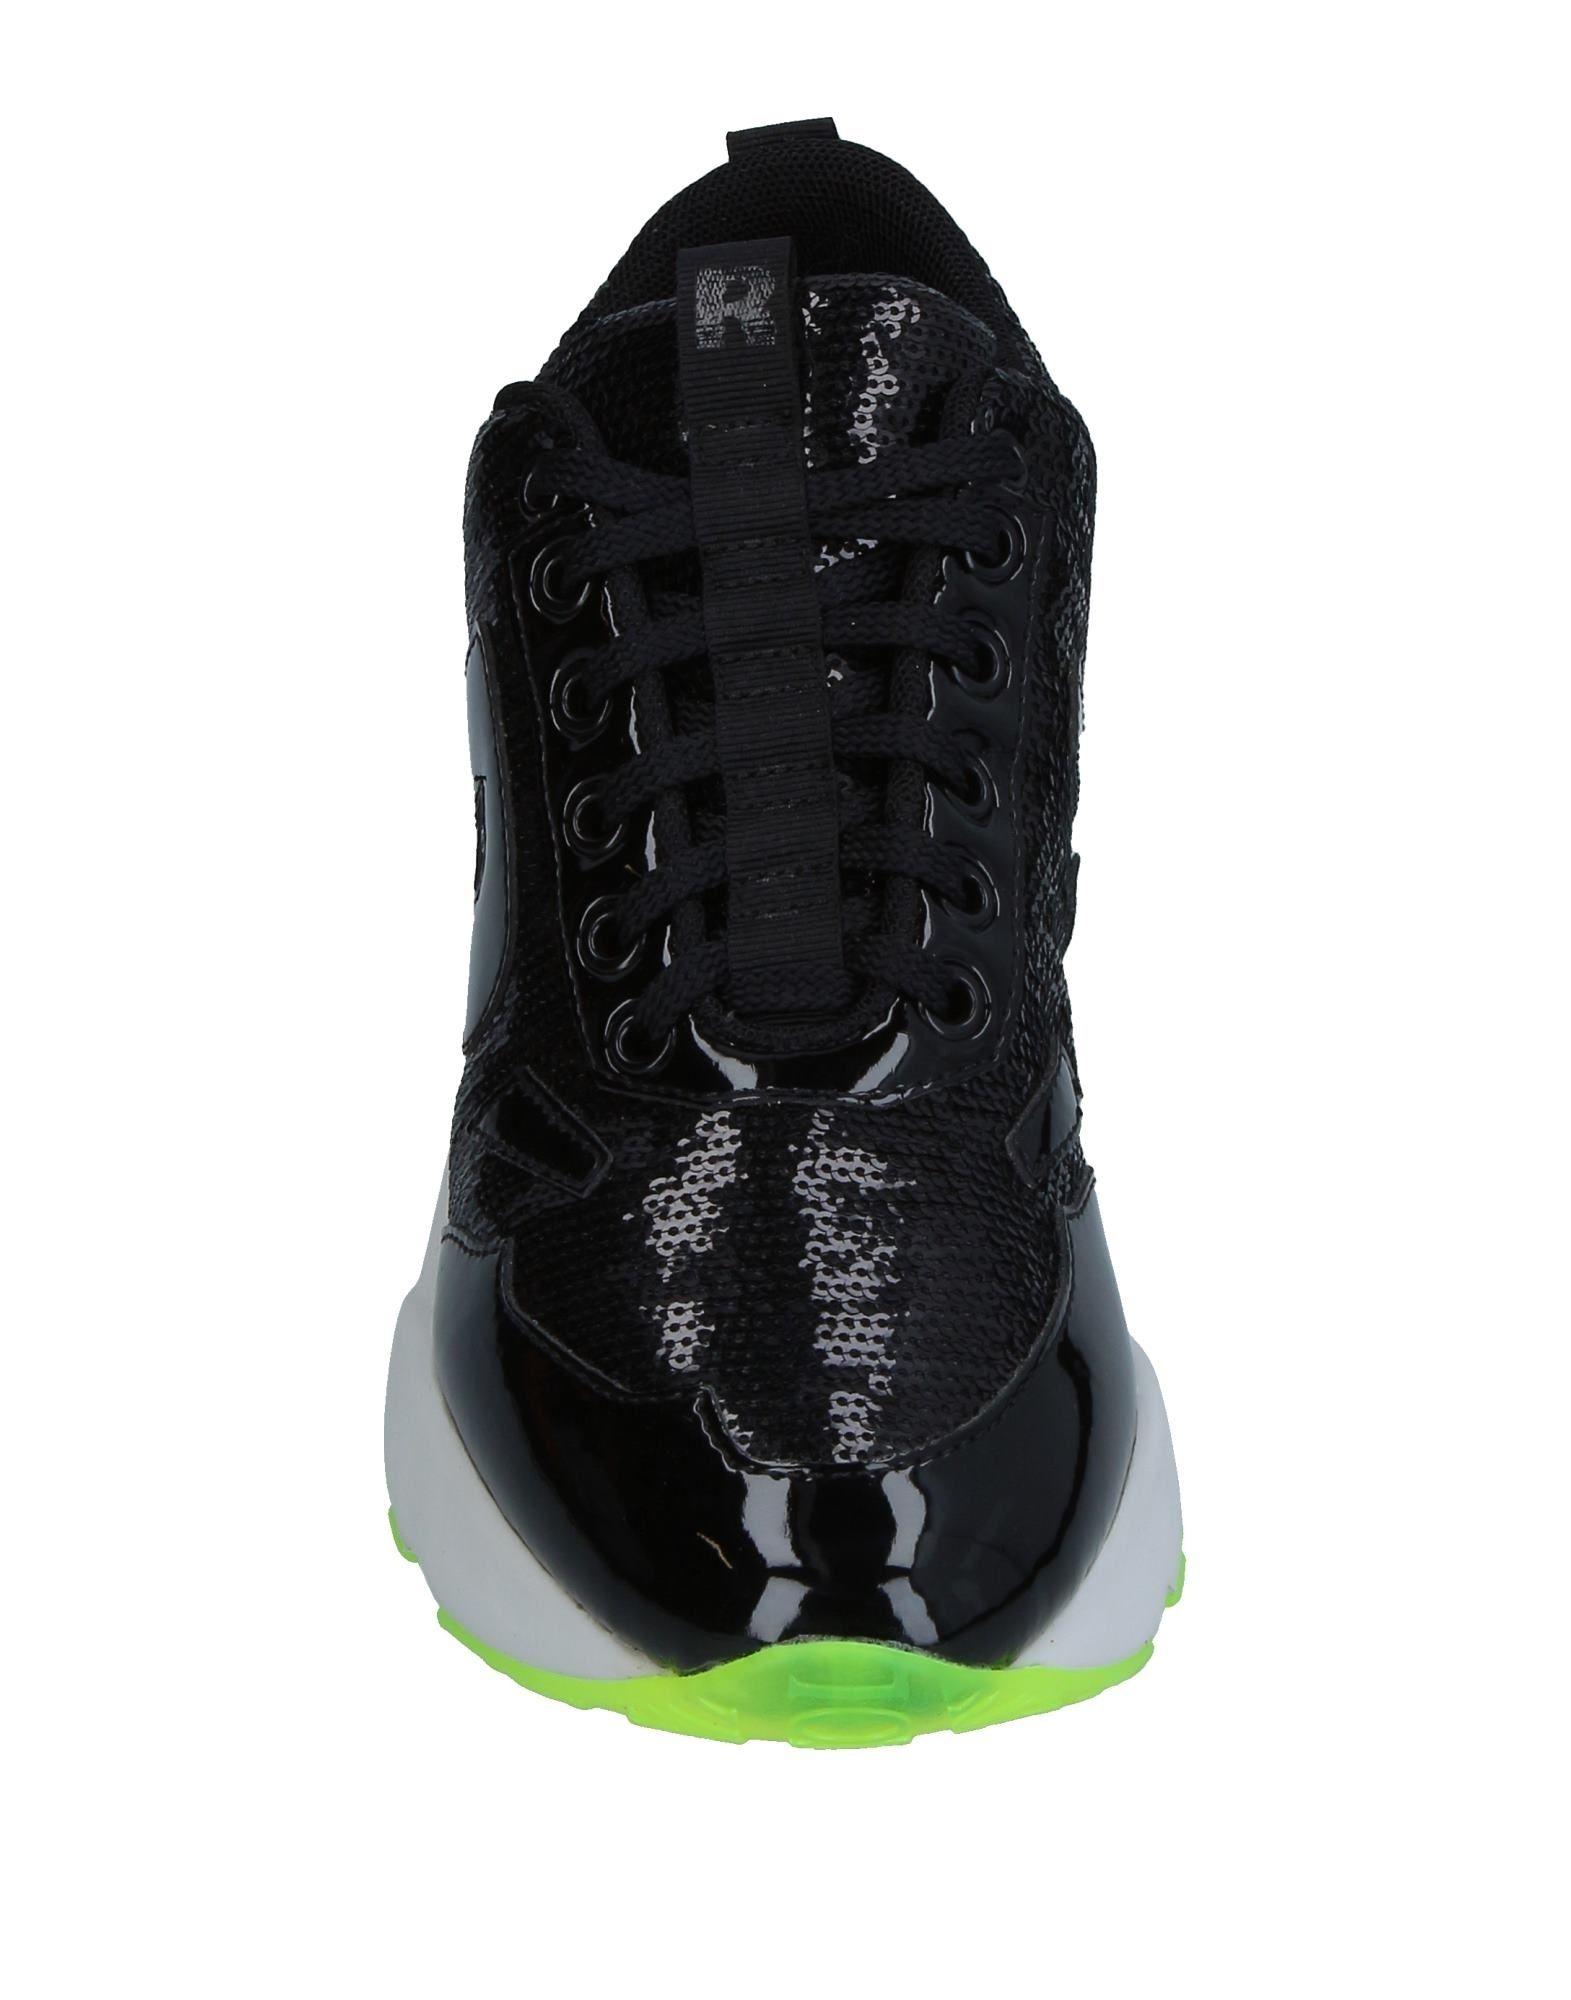 Stilvolle billige Sneakers Schuhe Ruco Line Sneakers billige Damen  11316503FN 671e42